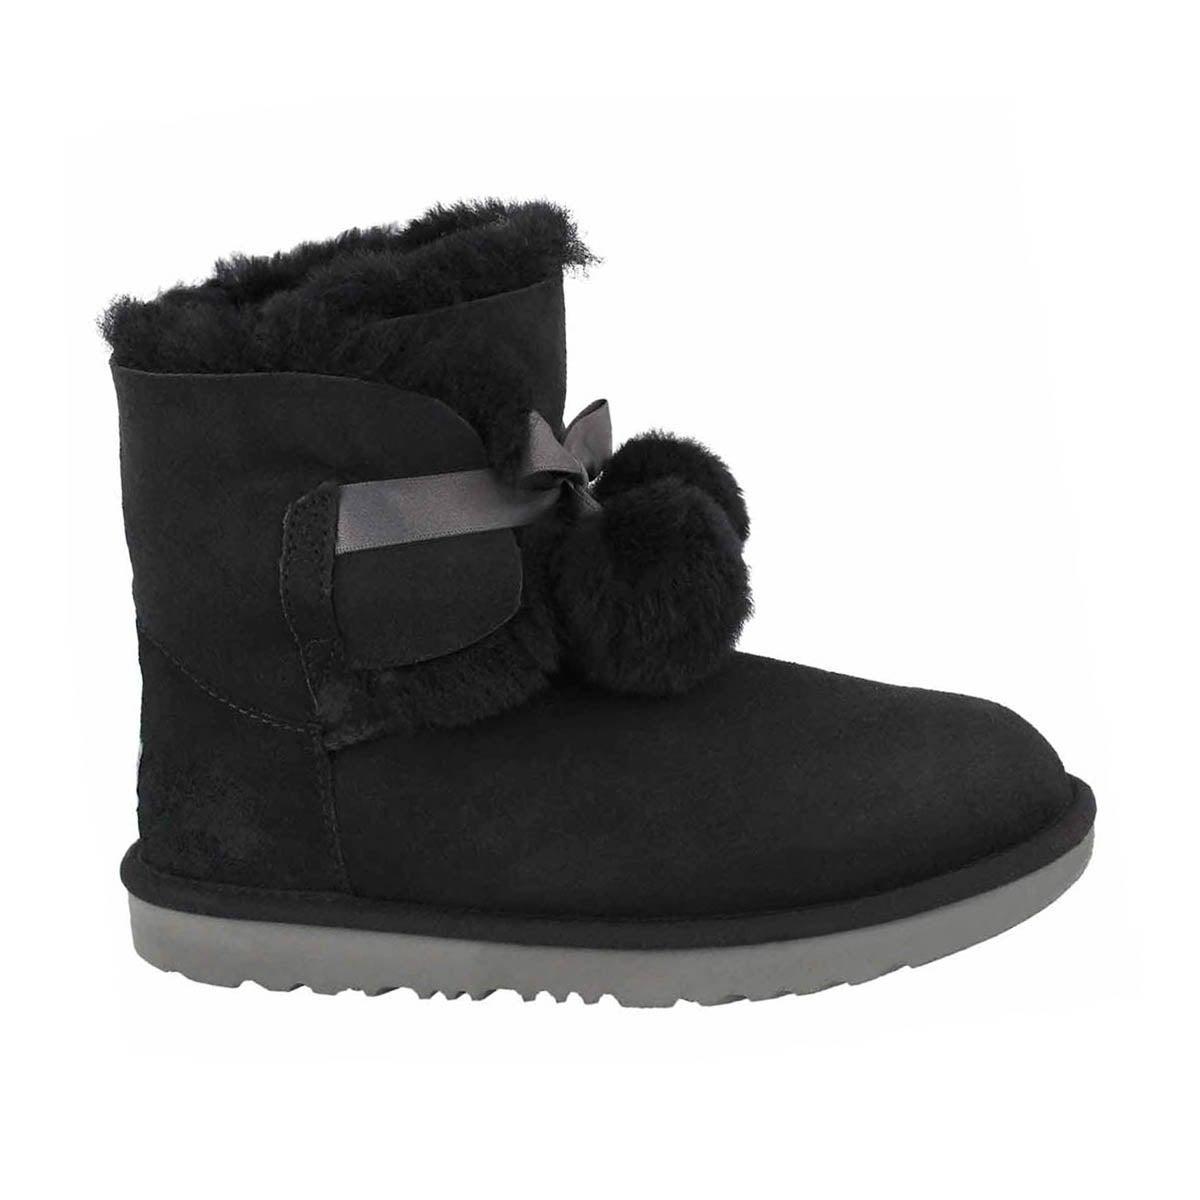 Girls' GITA black pom pom sheepskin boots